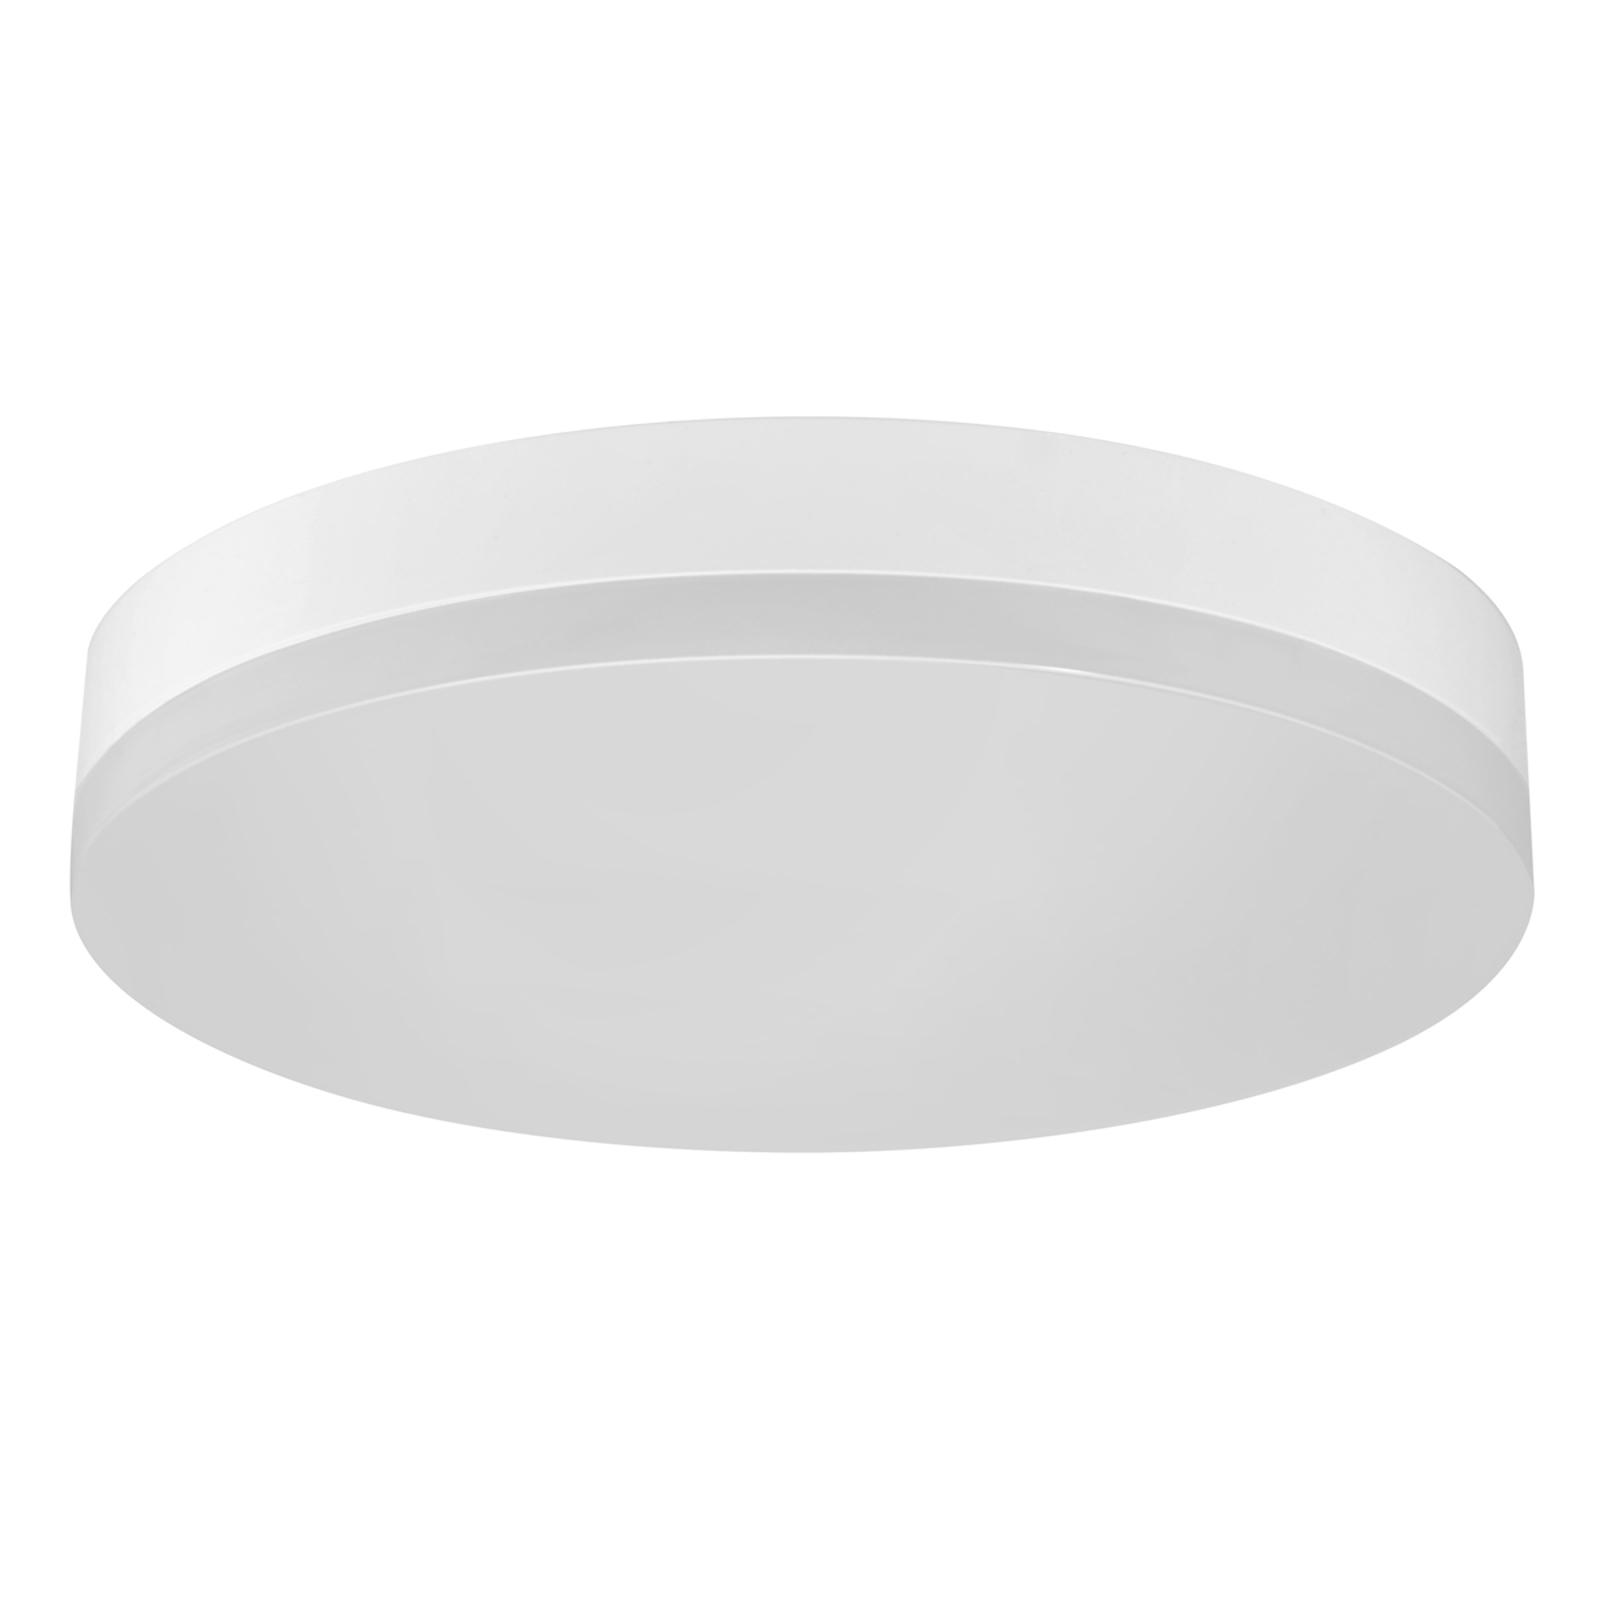 Office Round - plafoniera LED IP44, bianco caldo